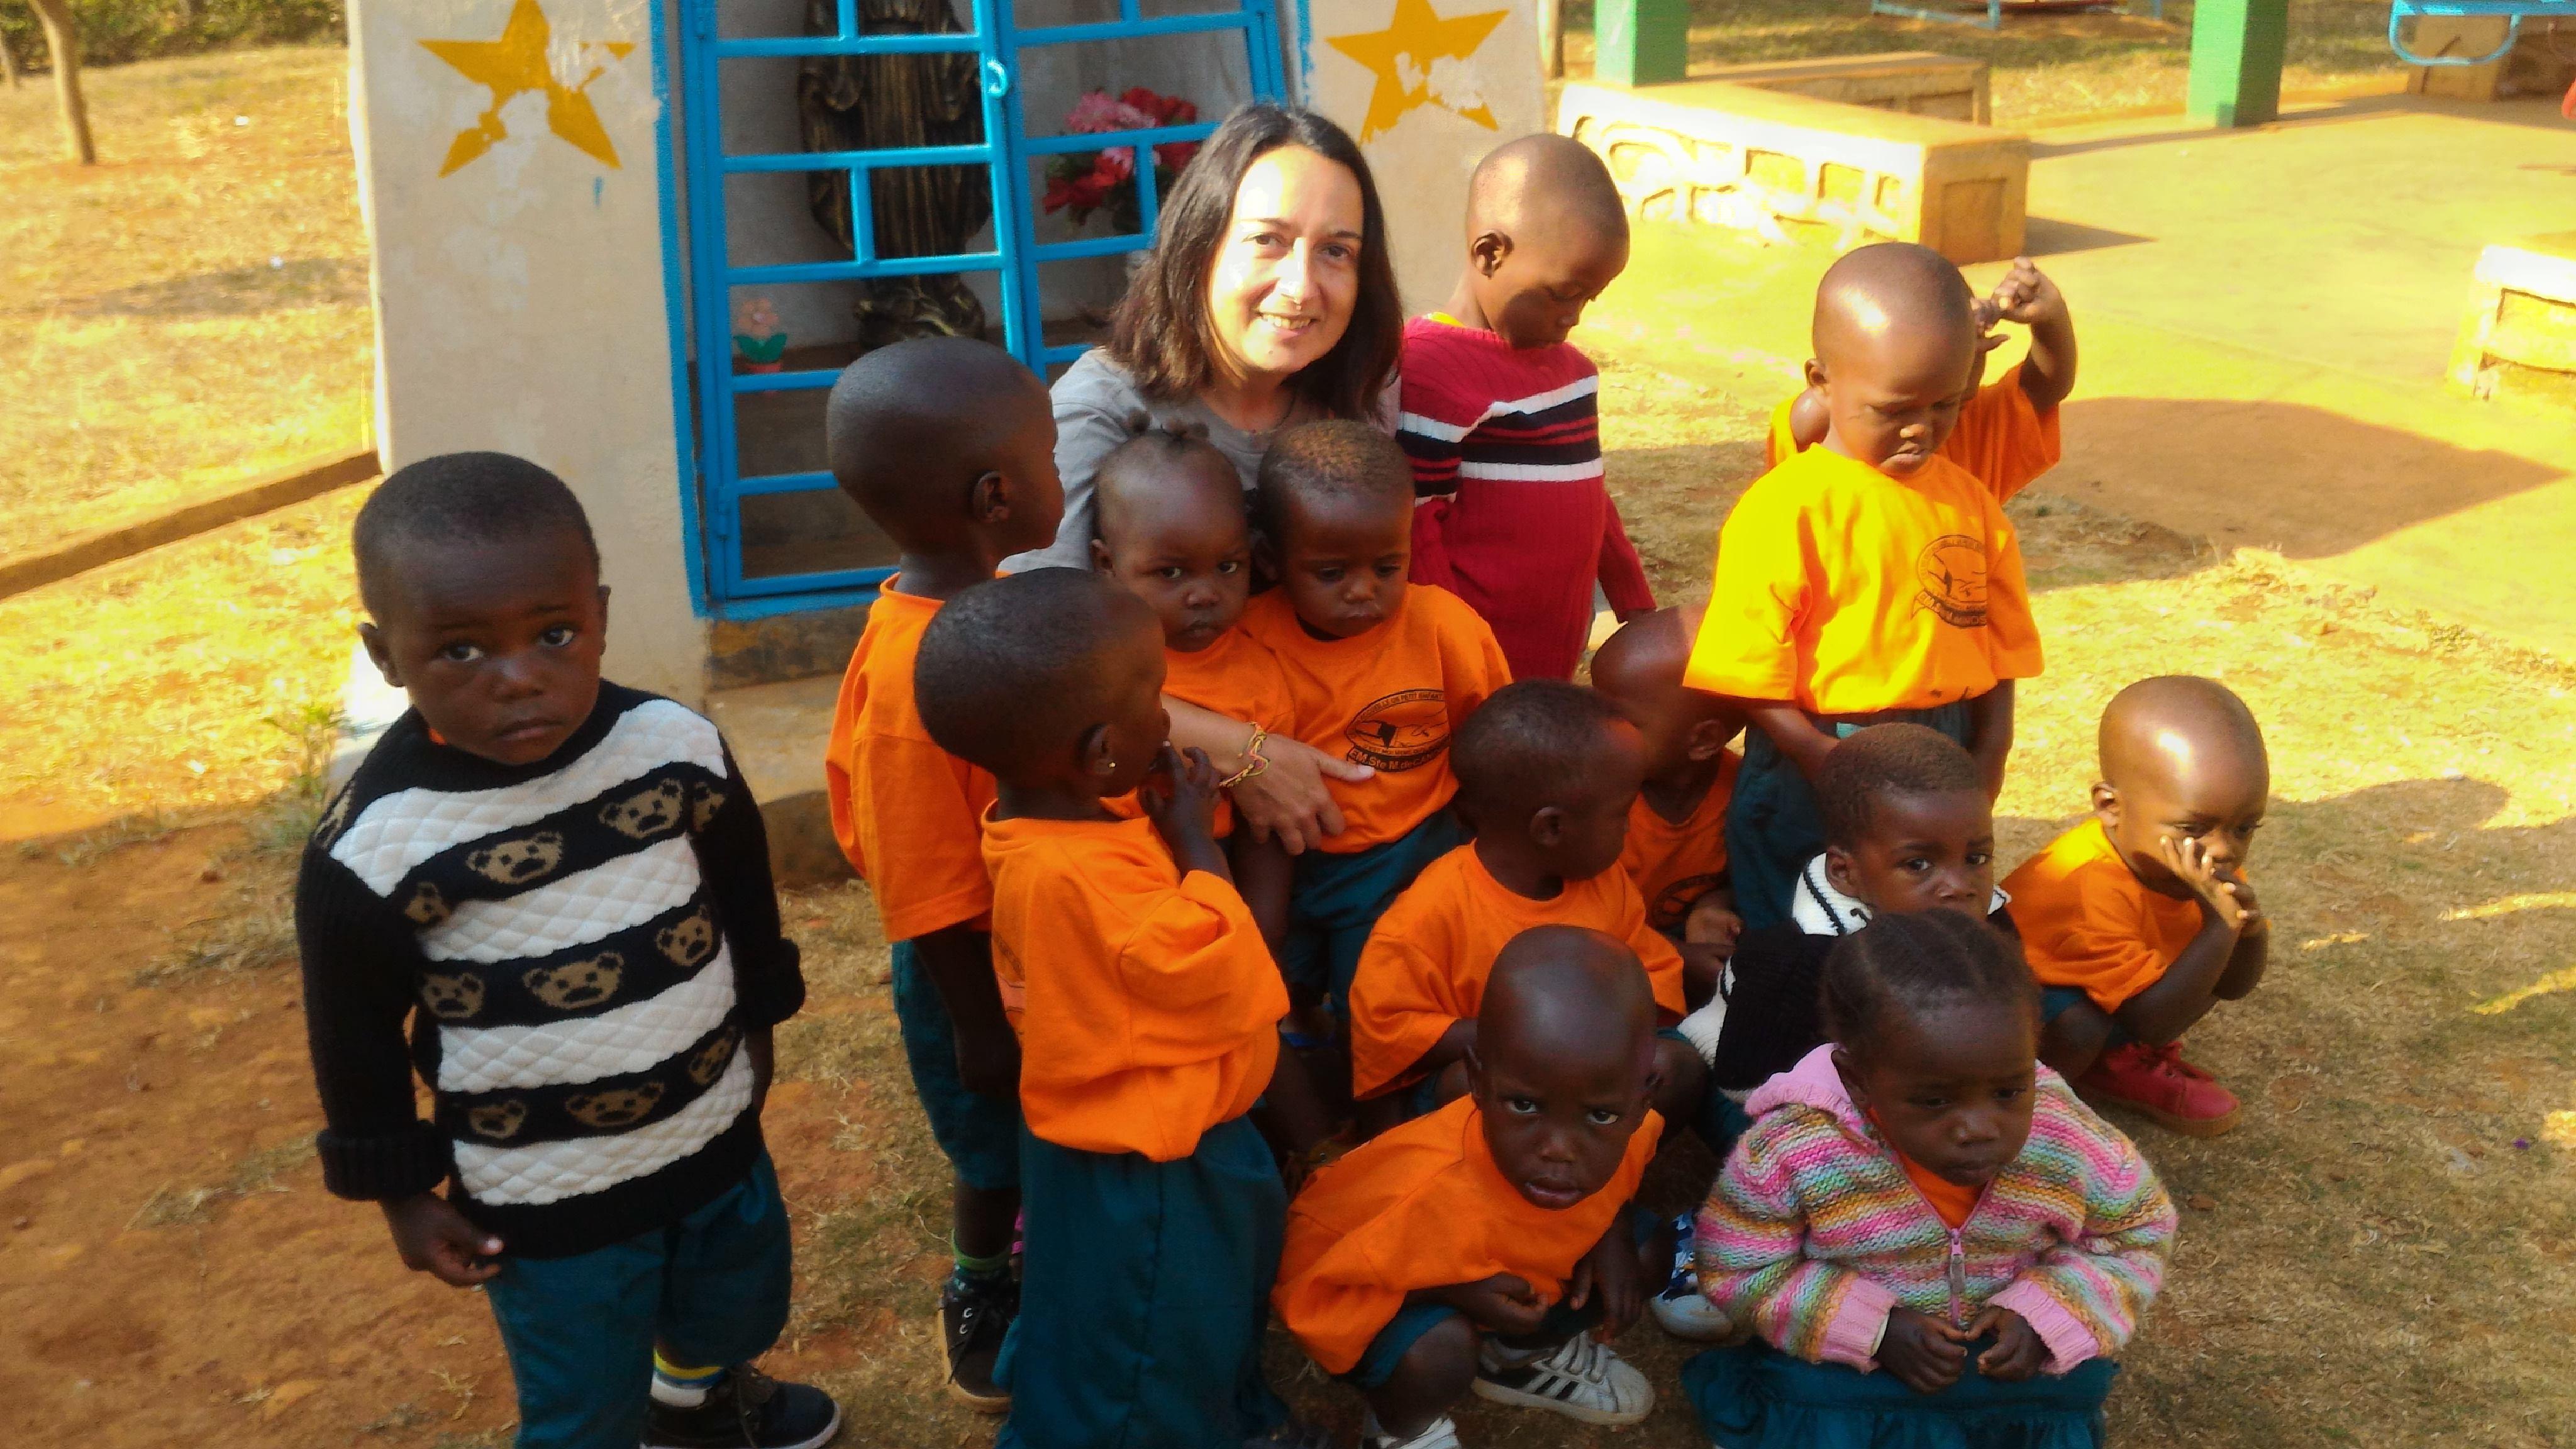 VOLONTARIATO LAICO IN CONGO